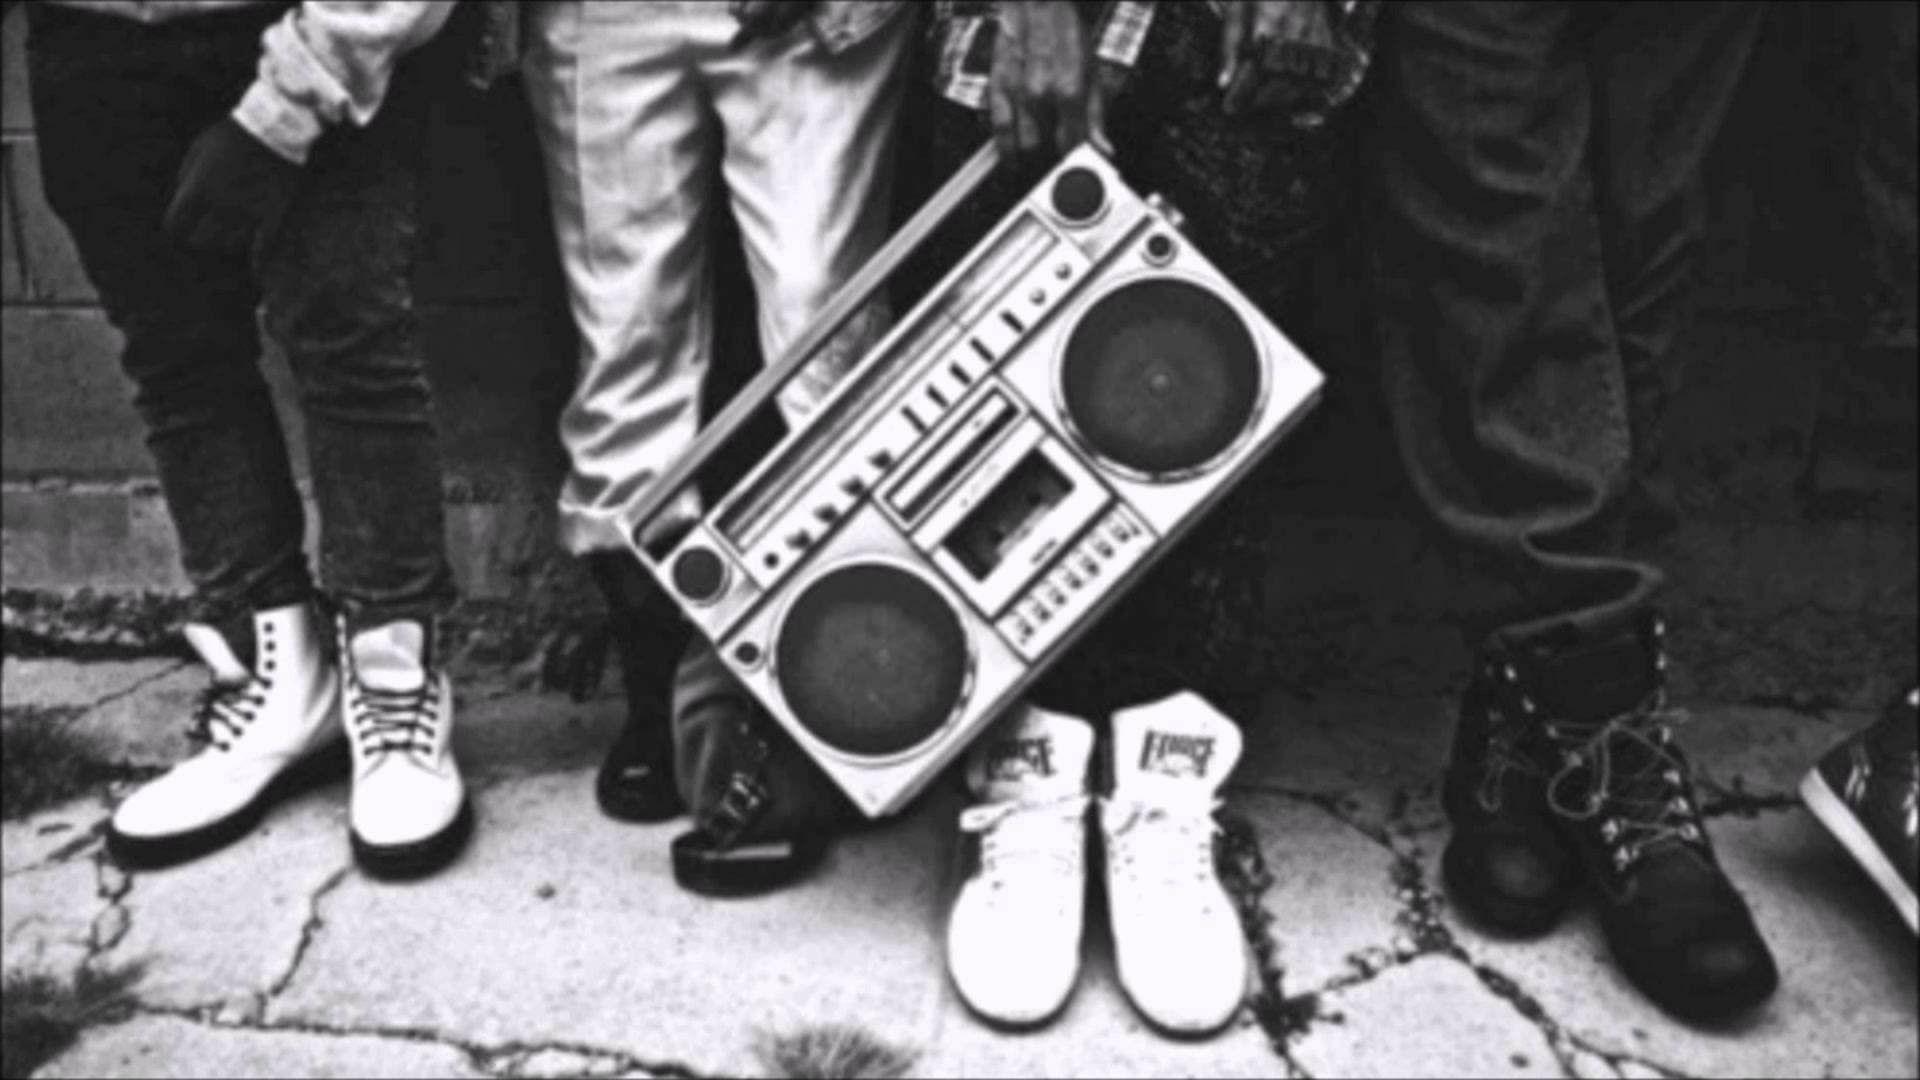 CLASSIC BOOM BAP Livin' The Fast Life (Prod by Moshae Beats) 97 bpm